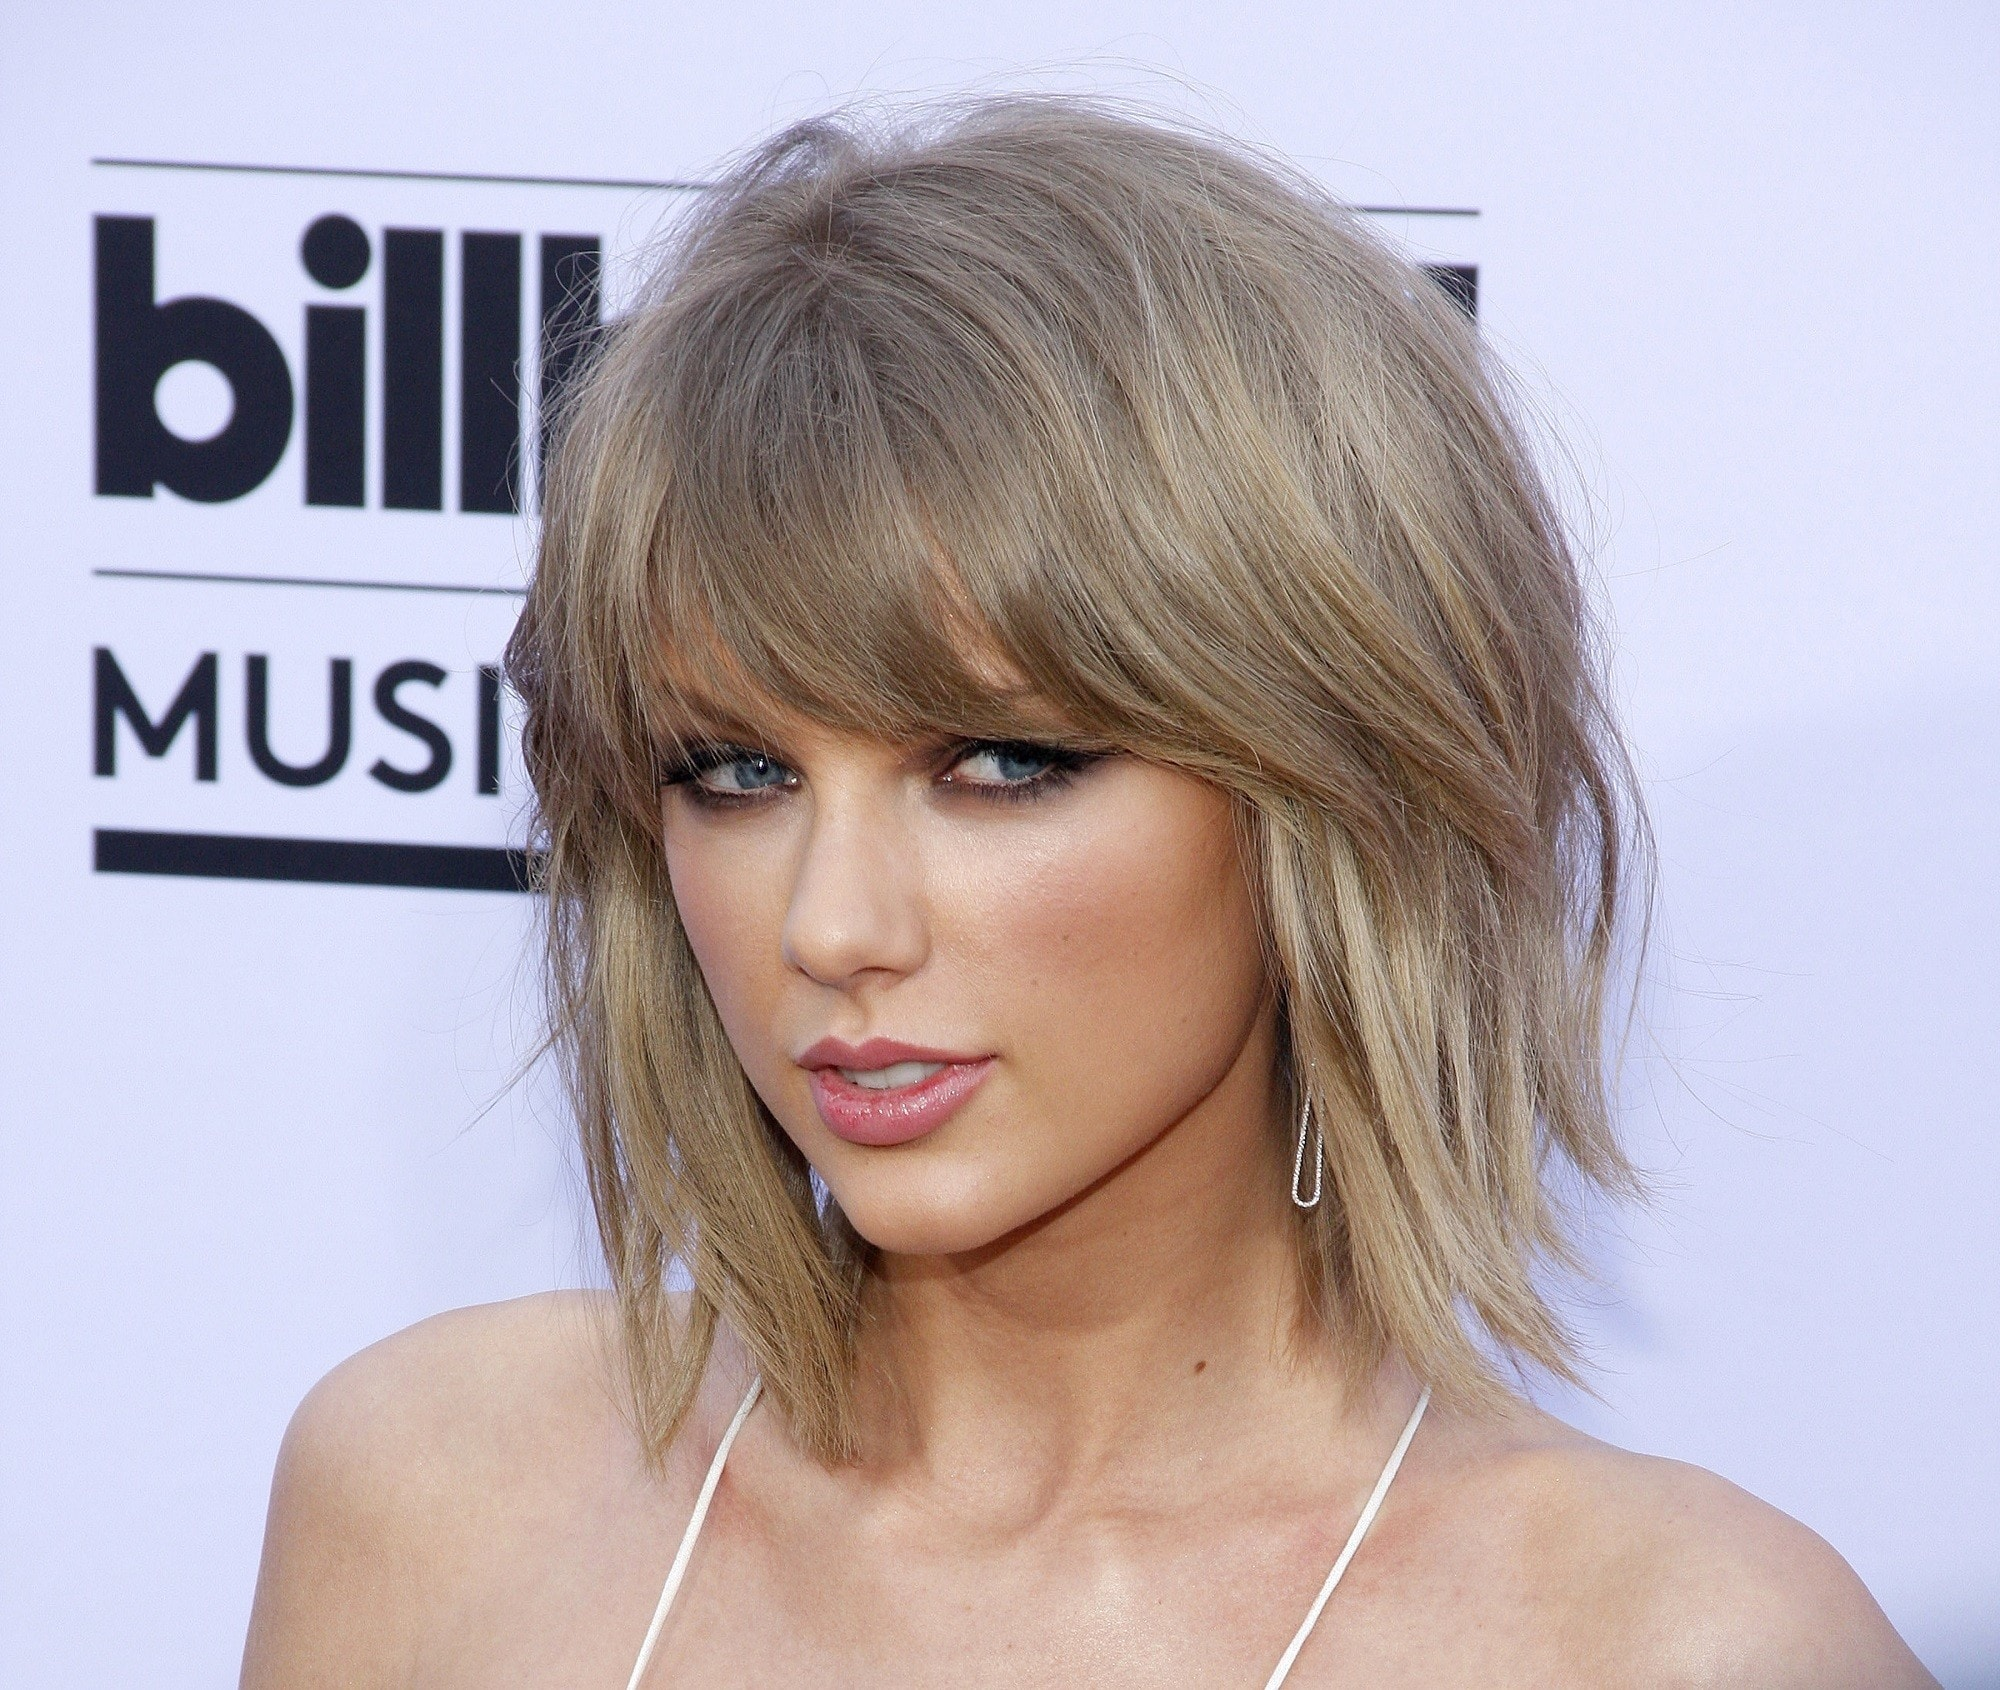 Taylor Swift dengan model rambut pendek untuk wanita karier